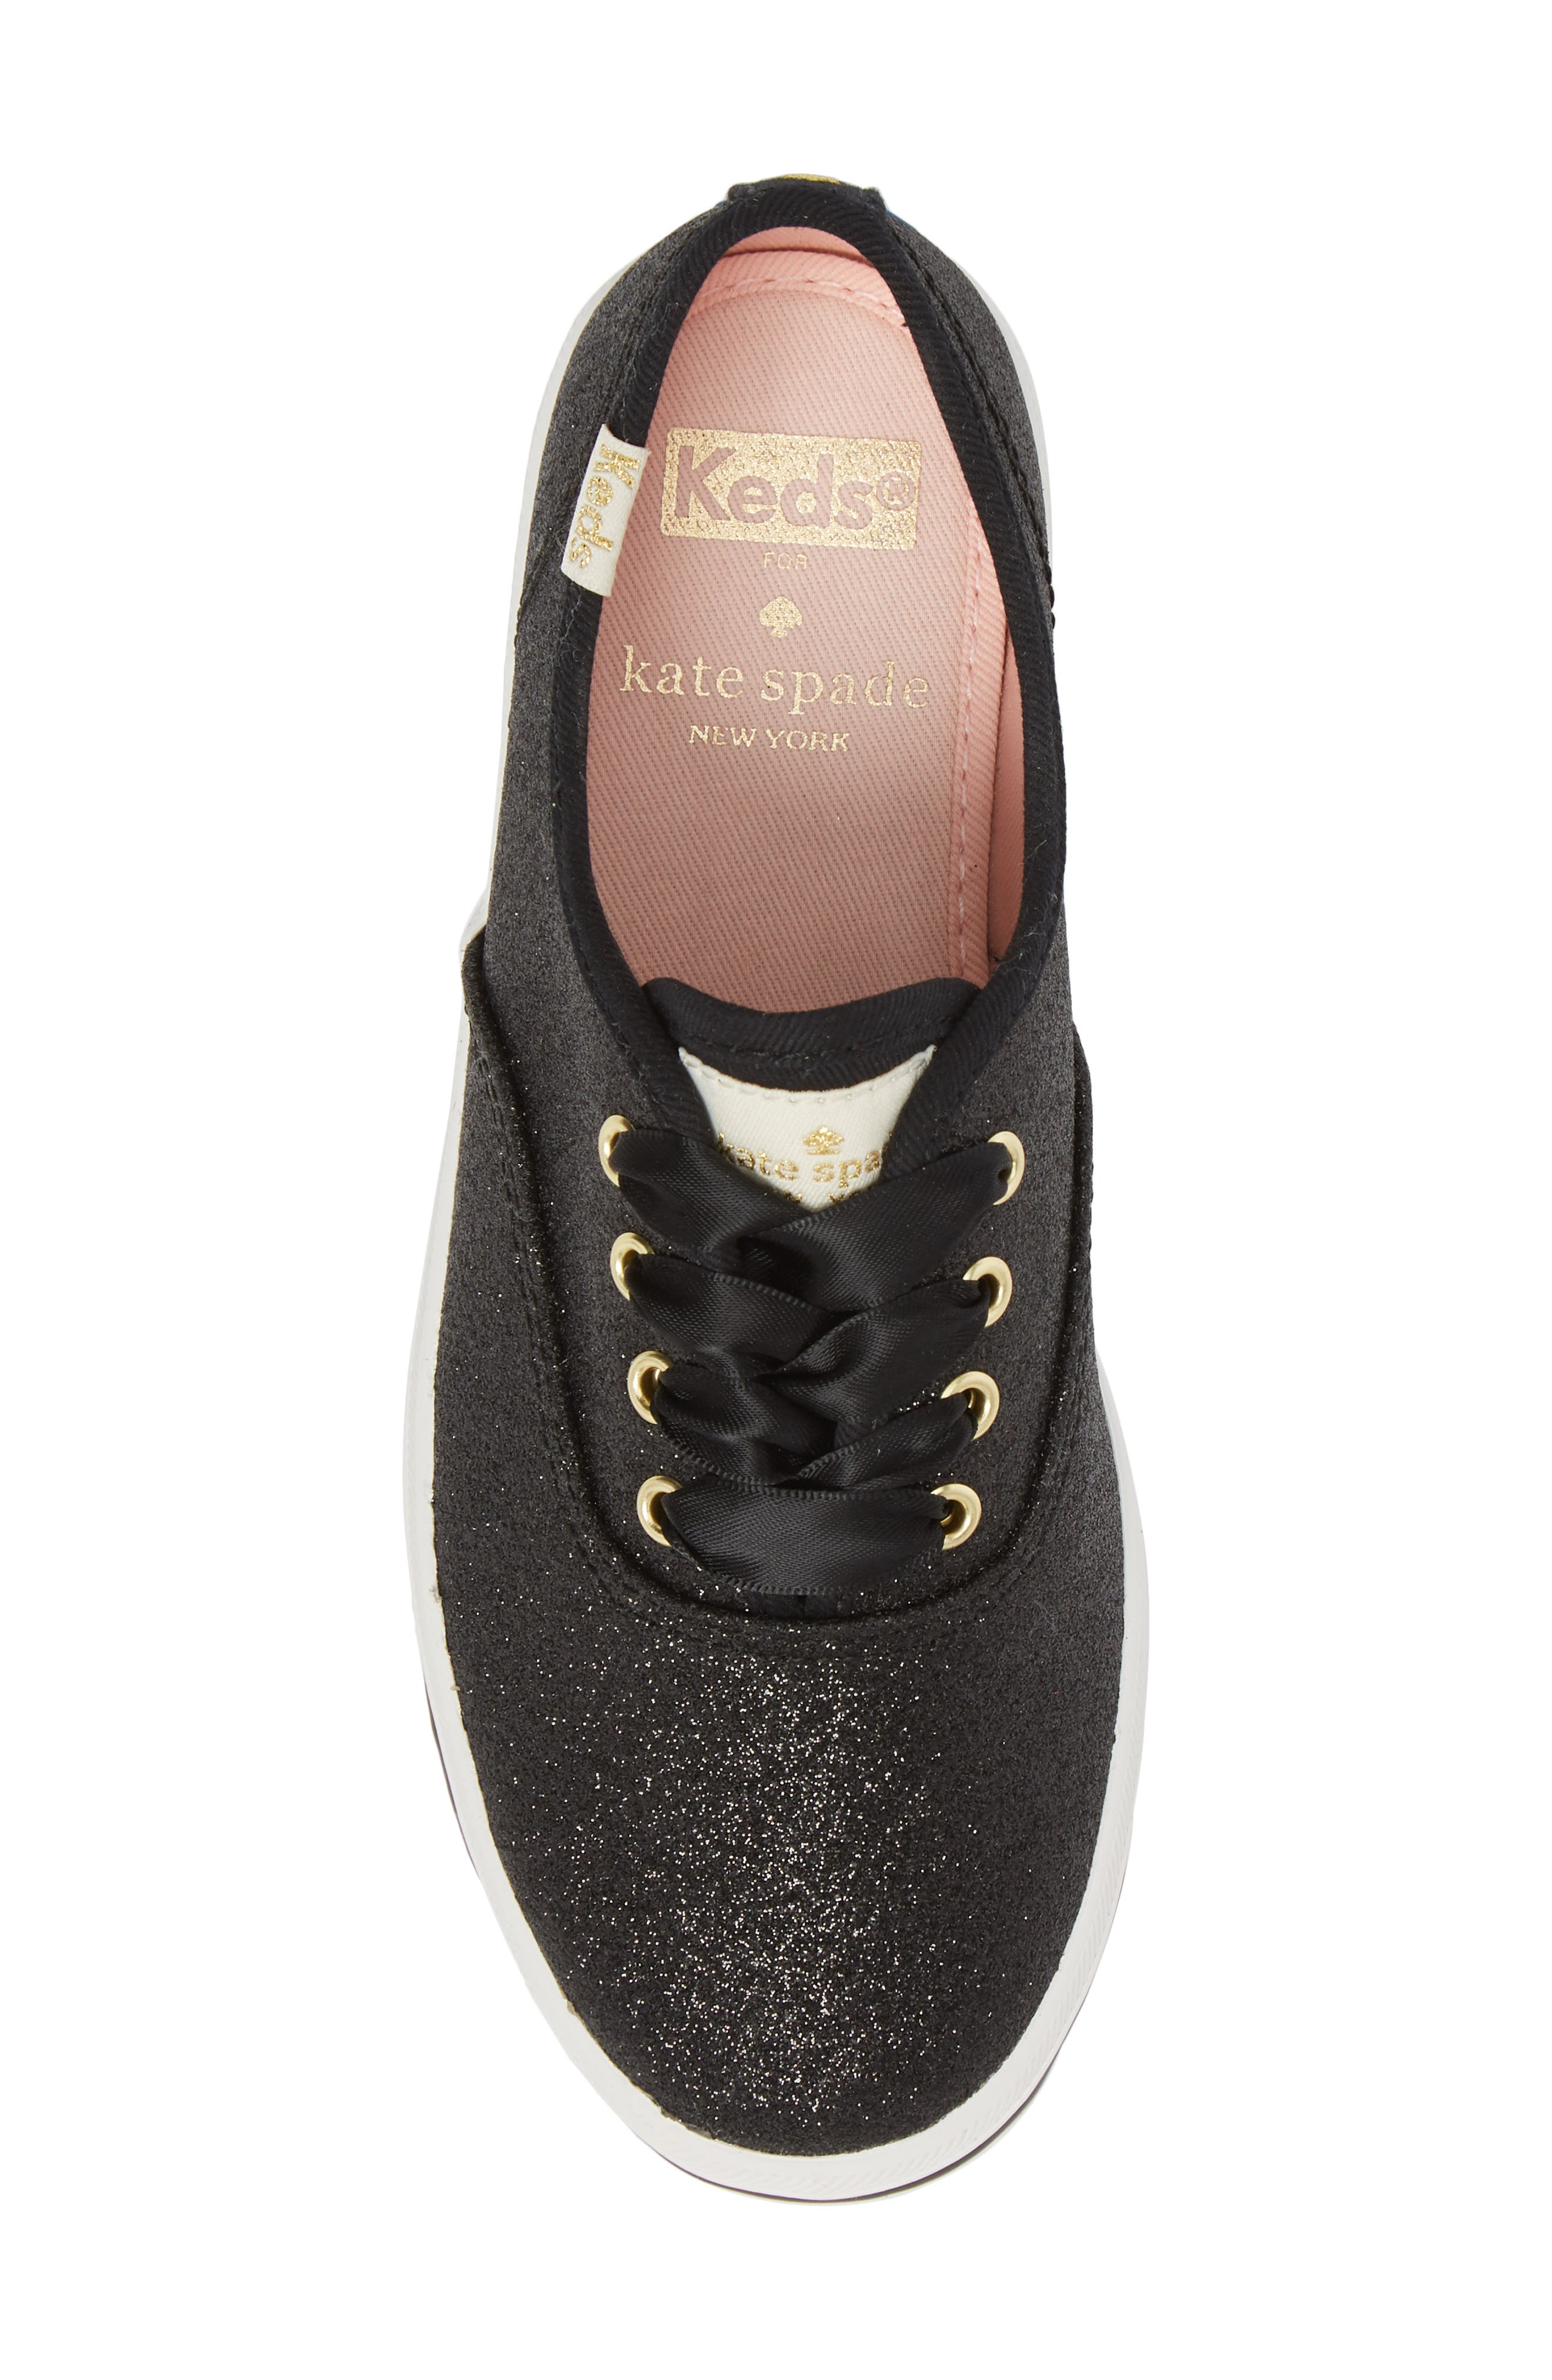 x kate spade new york Champion Glitter Sneaker,                             Alternate thumbnail 4, color,                             Black